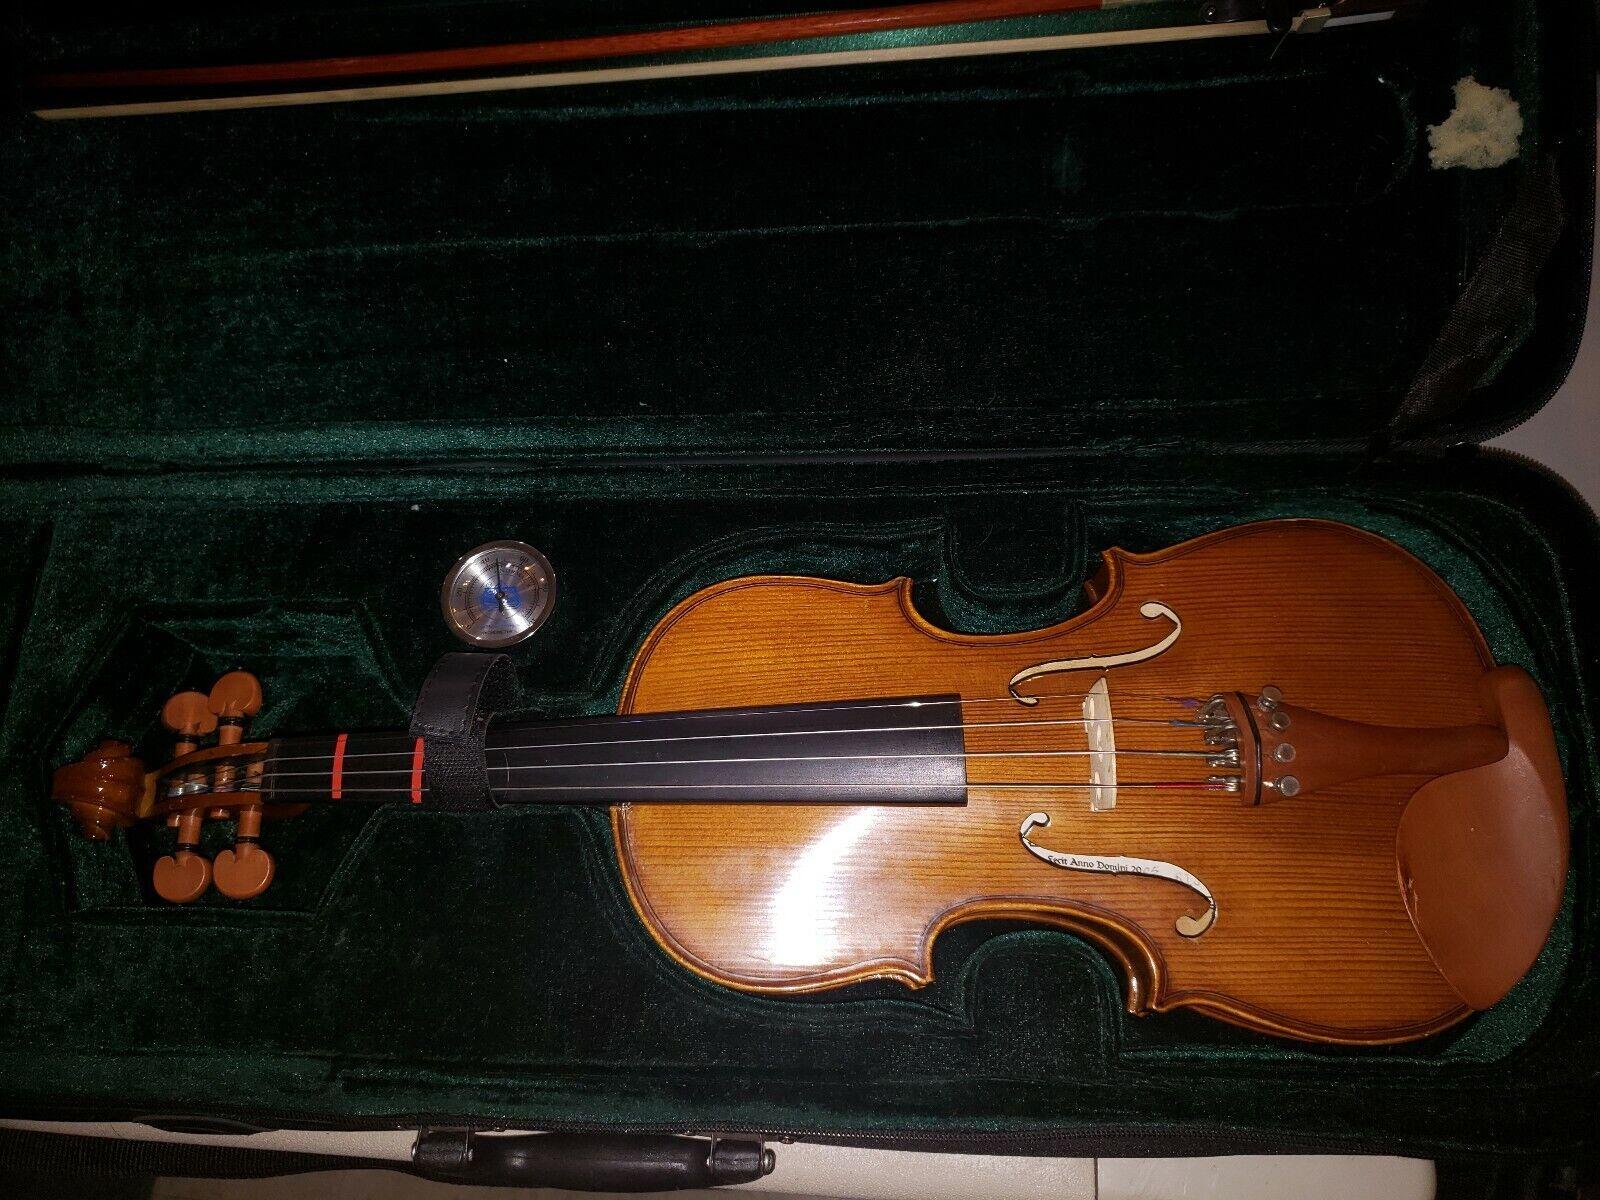 Cremona Violin SV-150 I 3 4 Größe violin with case